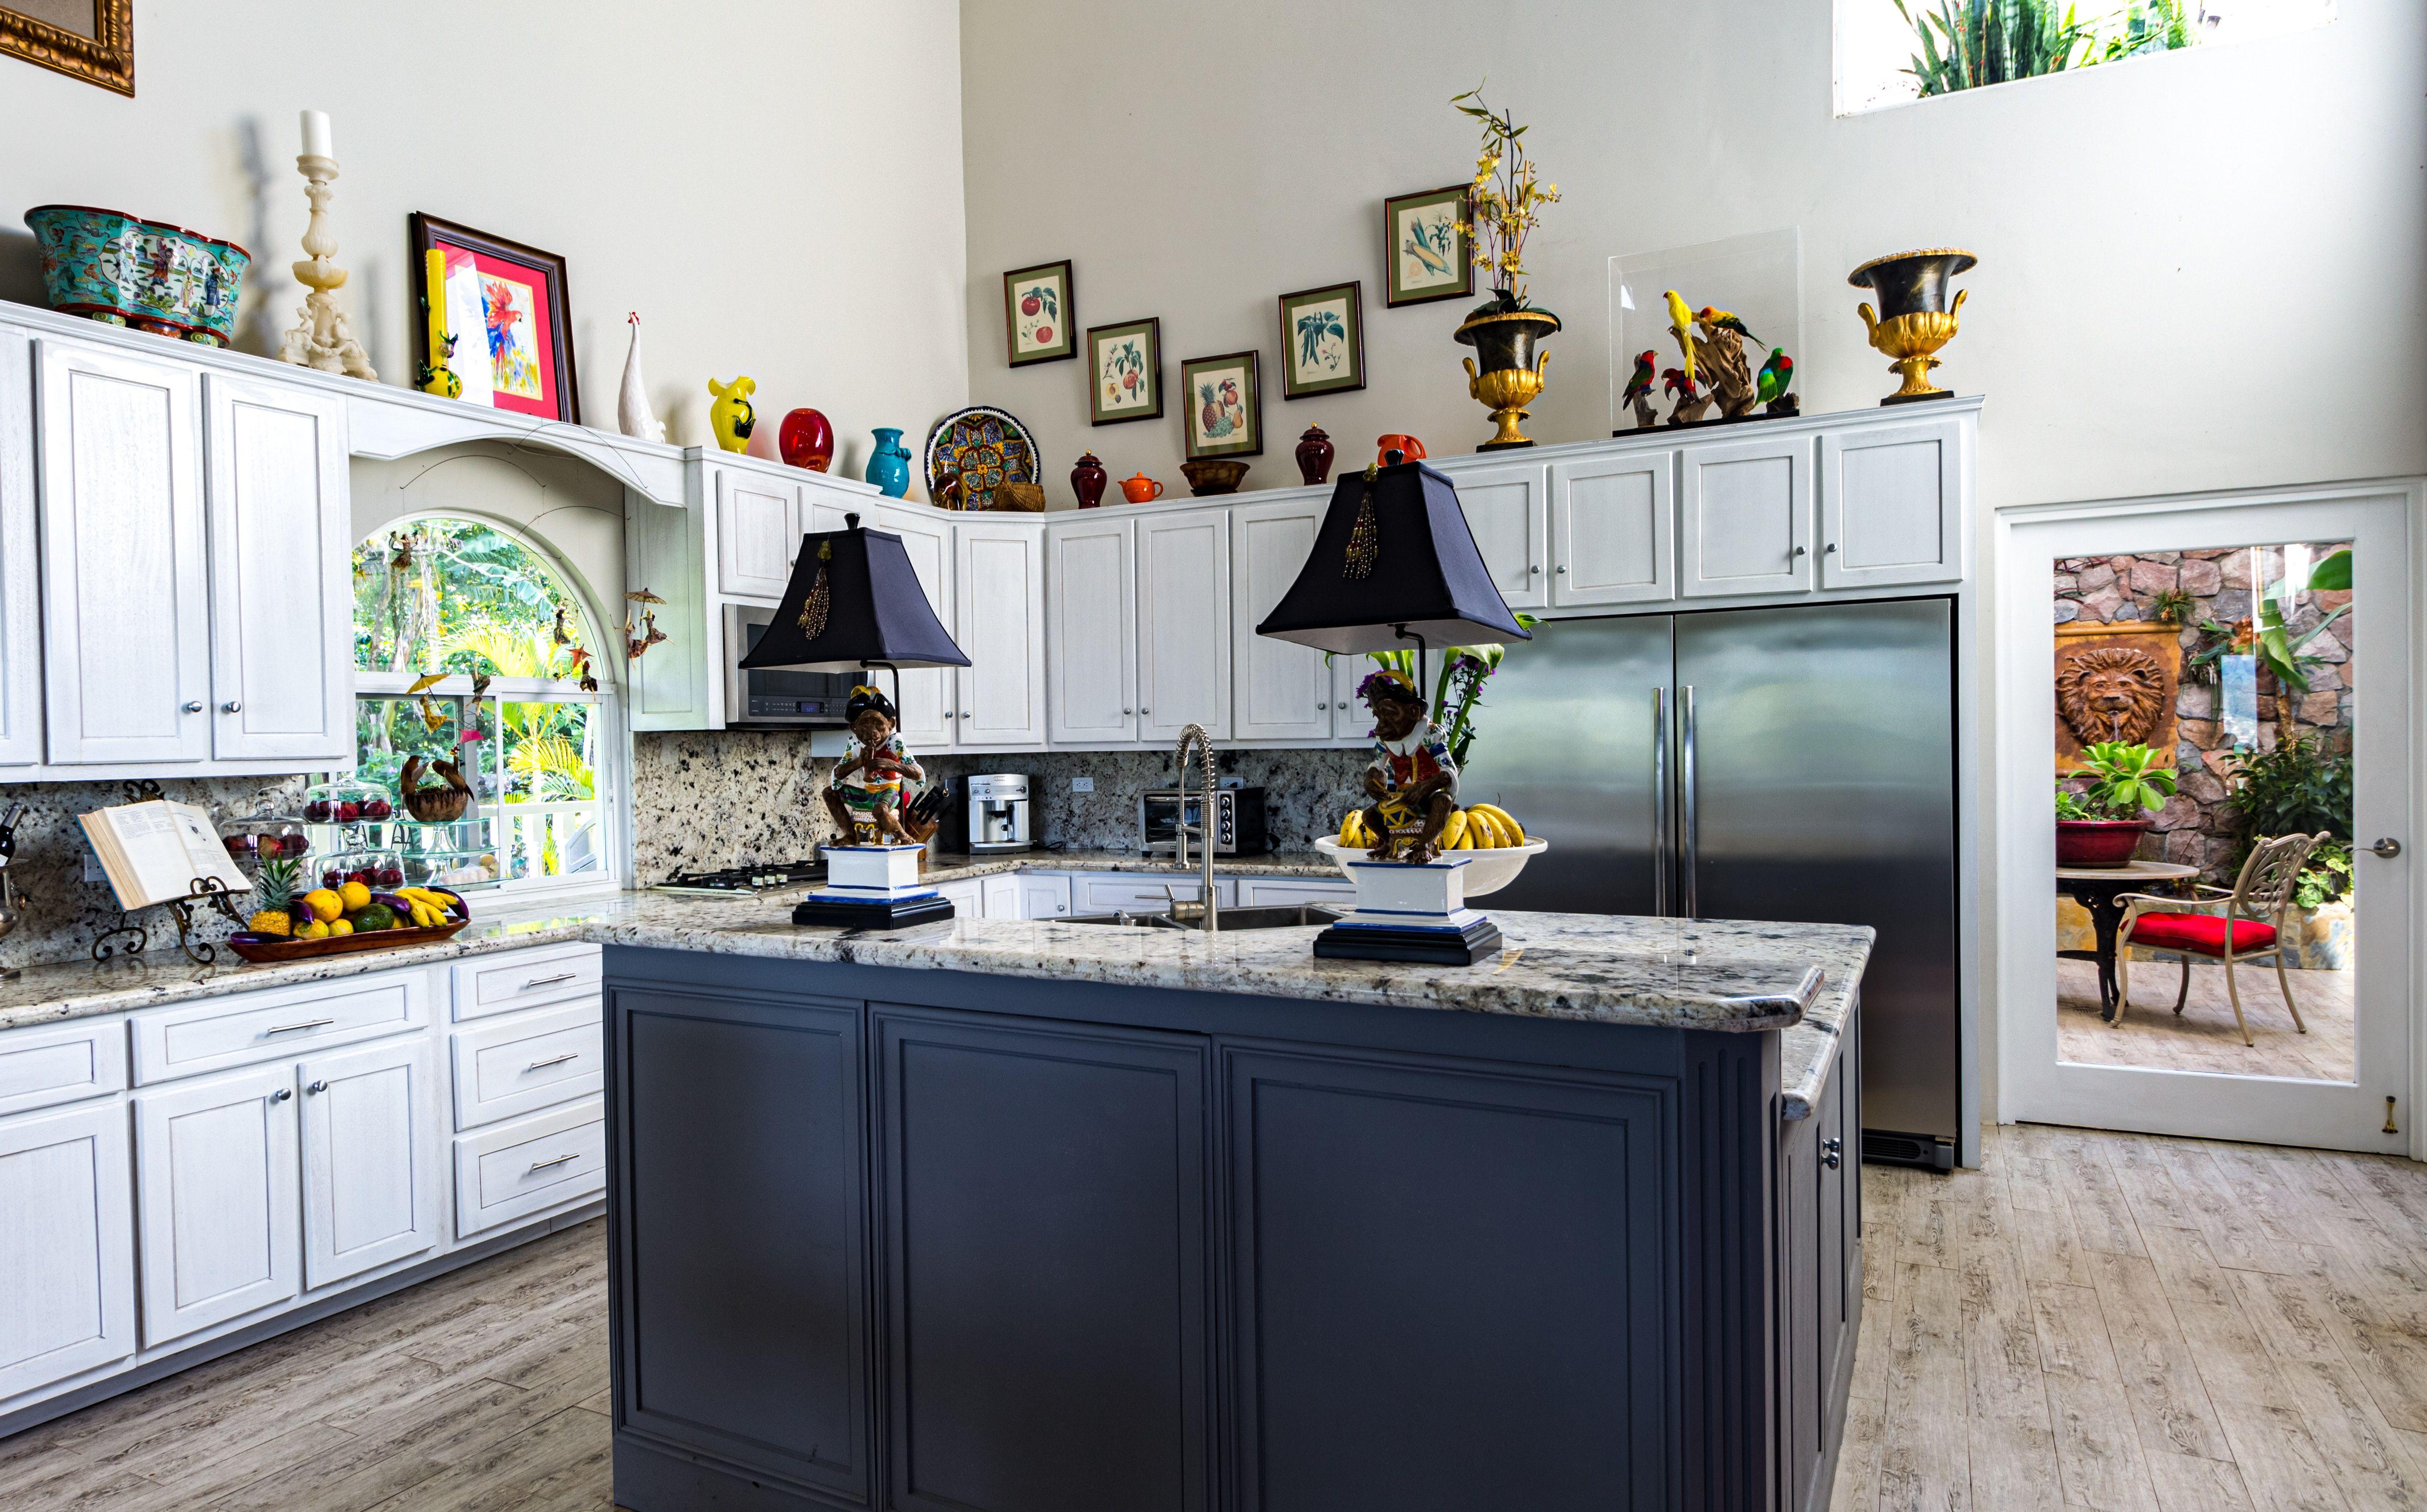 Granite Countertop Renewal In Tulsa Ok Jeff S Chem Dry Kitchen Design Kitchen Renovation Kitchen Remodel